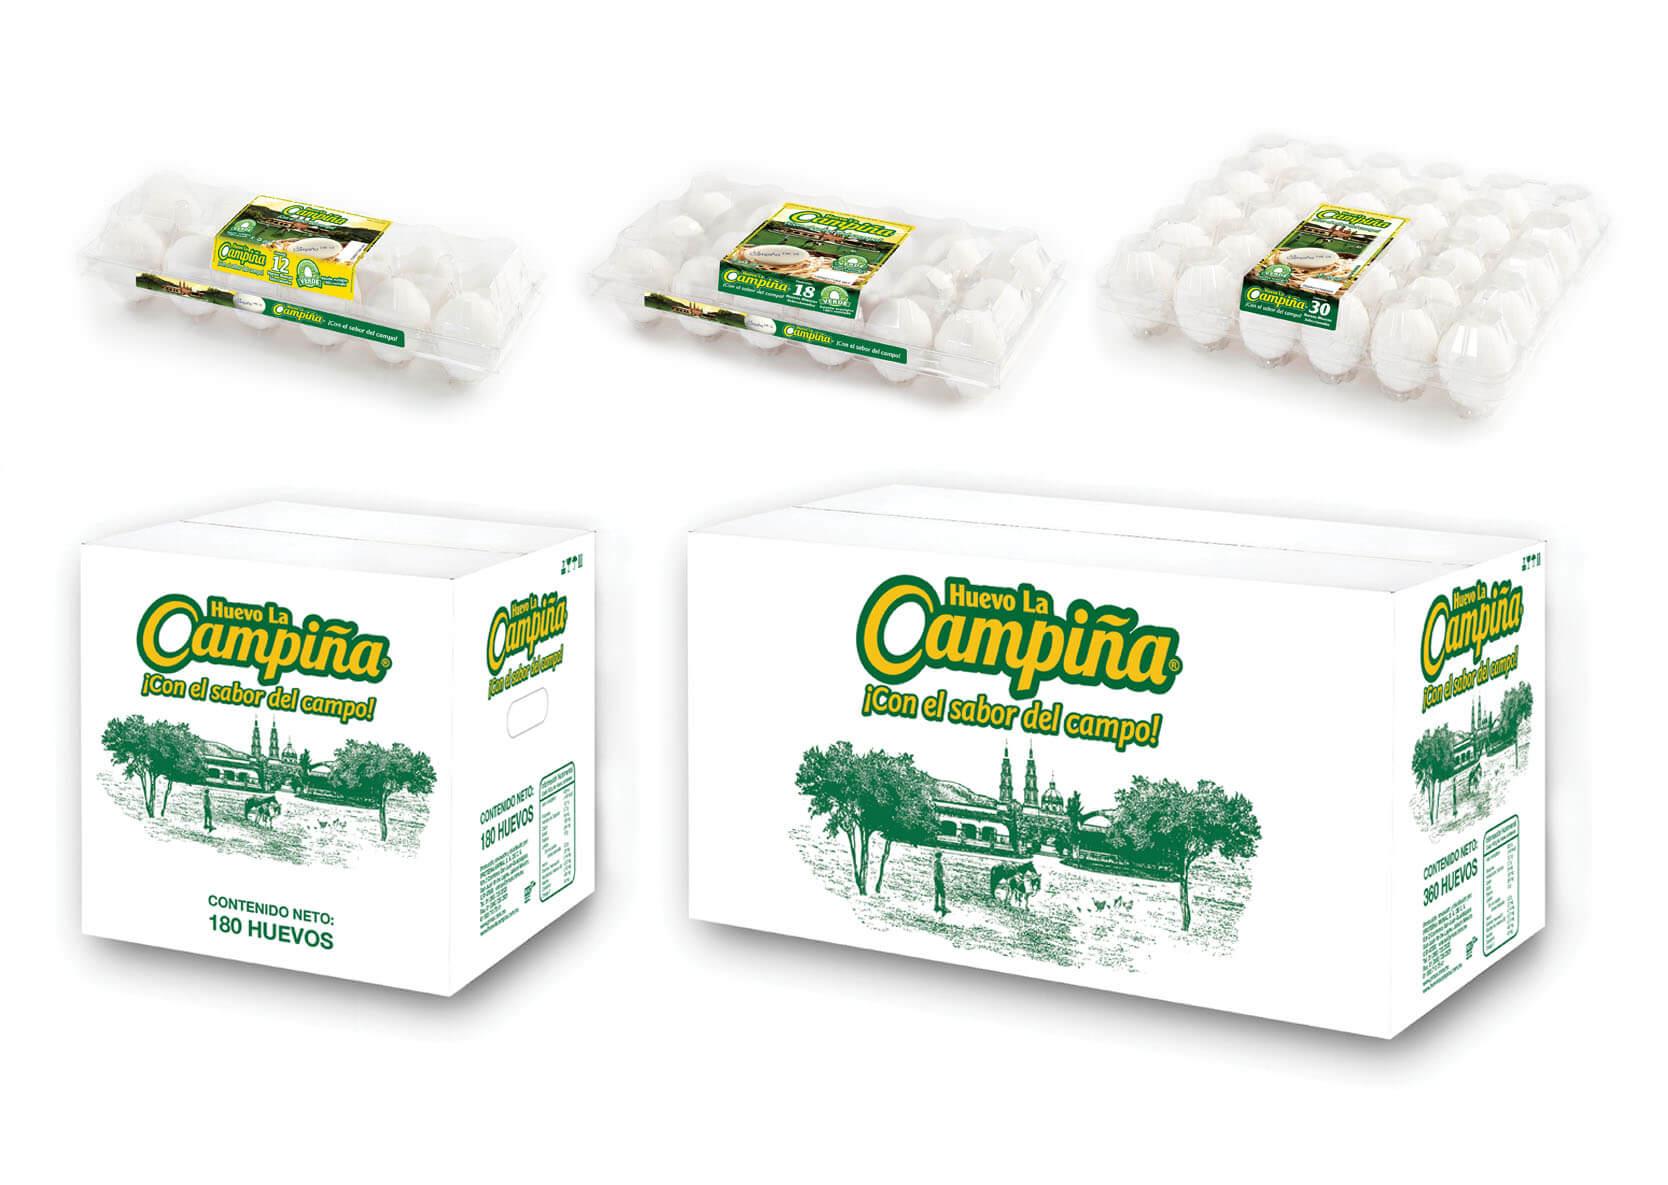 campiña packaging